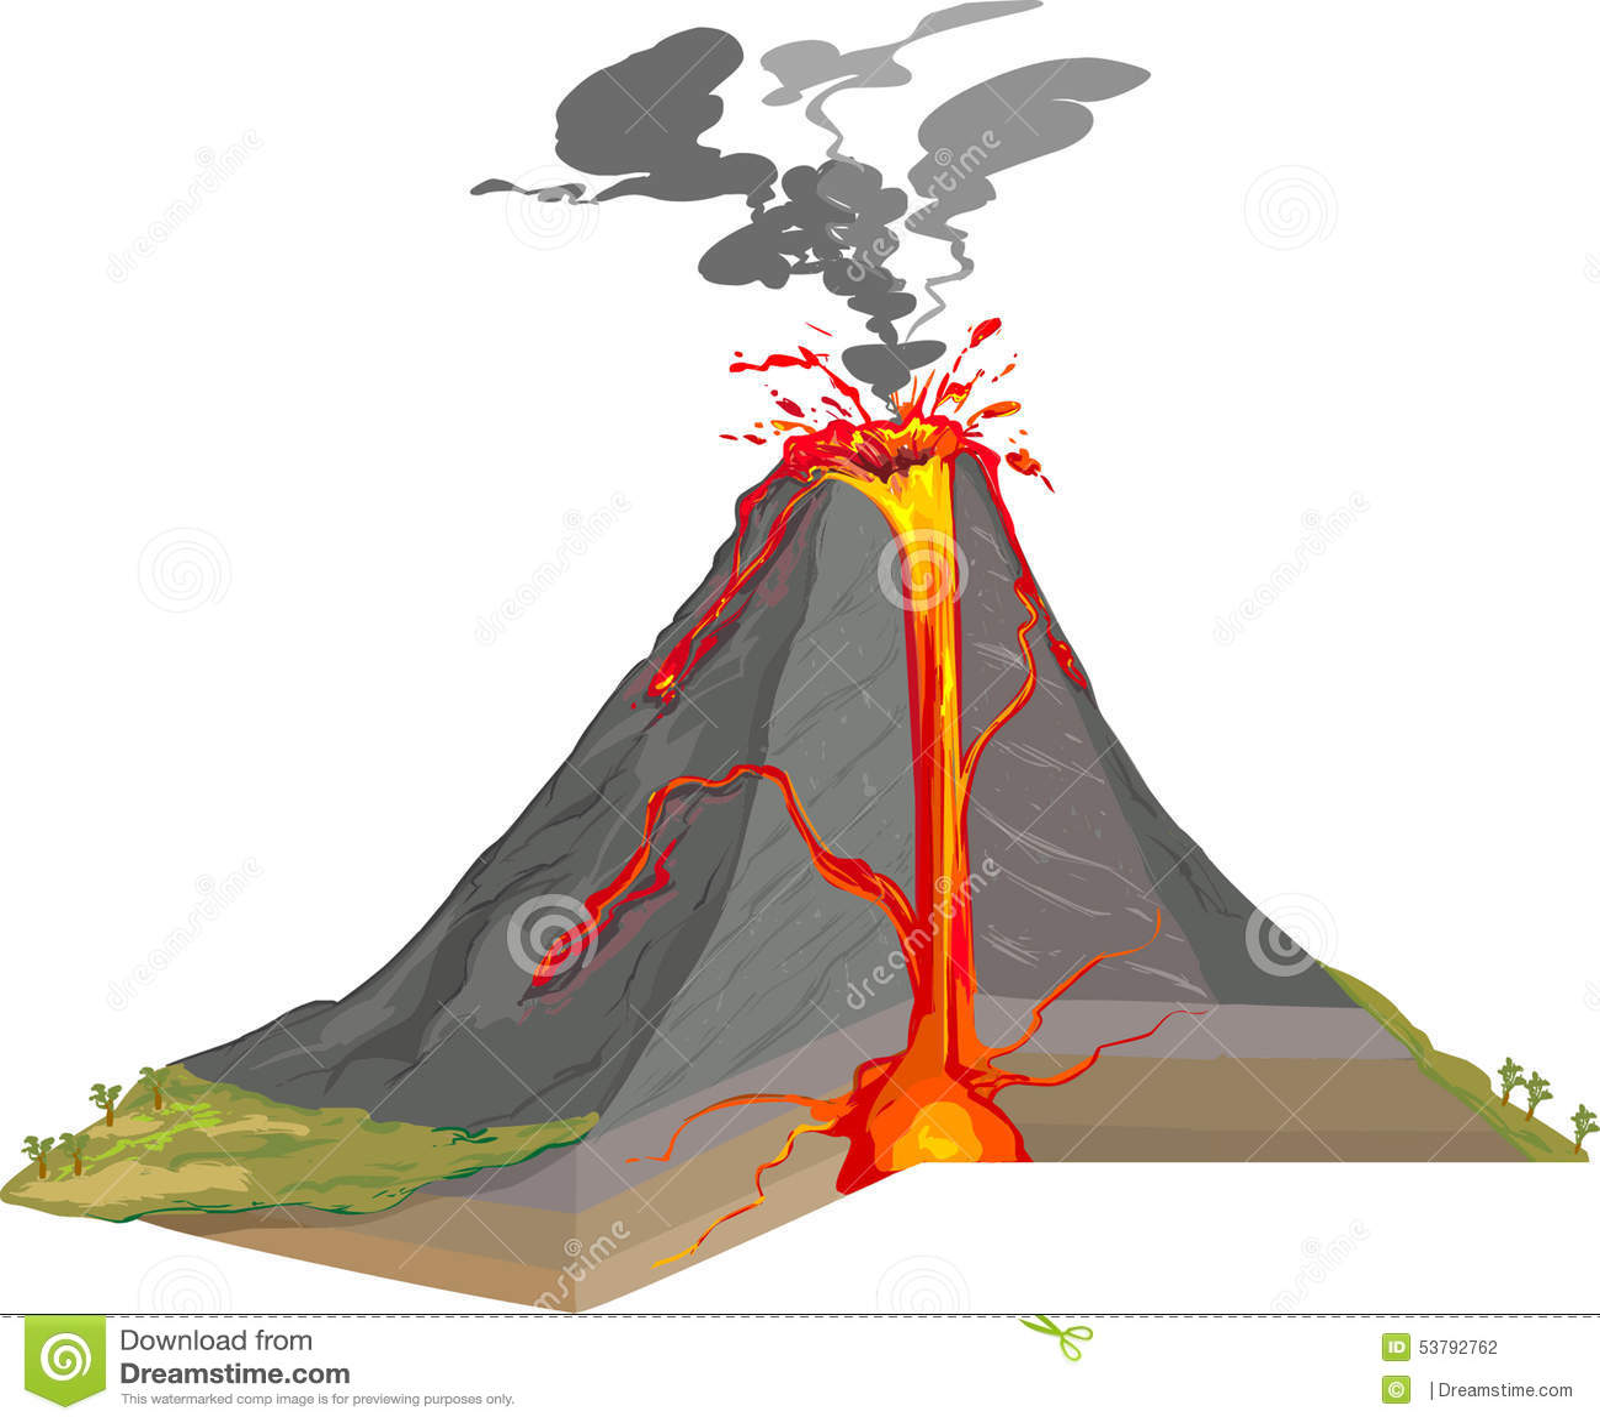 querschnitt des vulkans vektor abbildung illustration von kunst 53792762. Black Bedroom Furniture Sets. Home Design Ideas